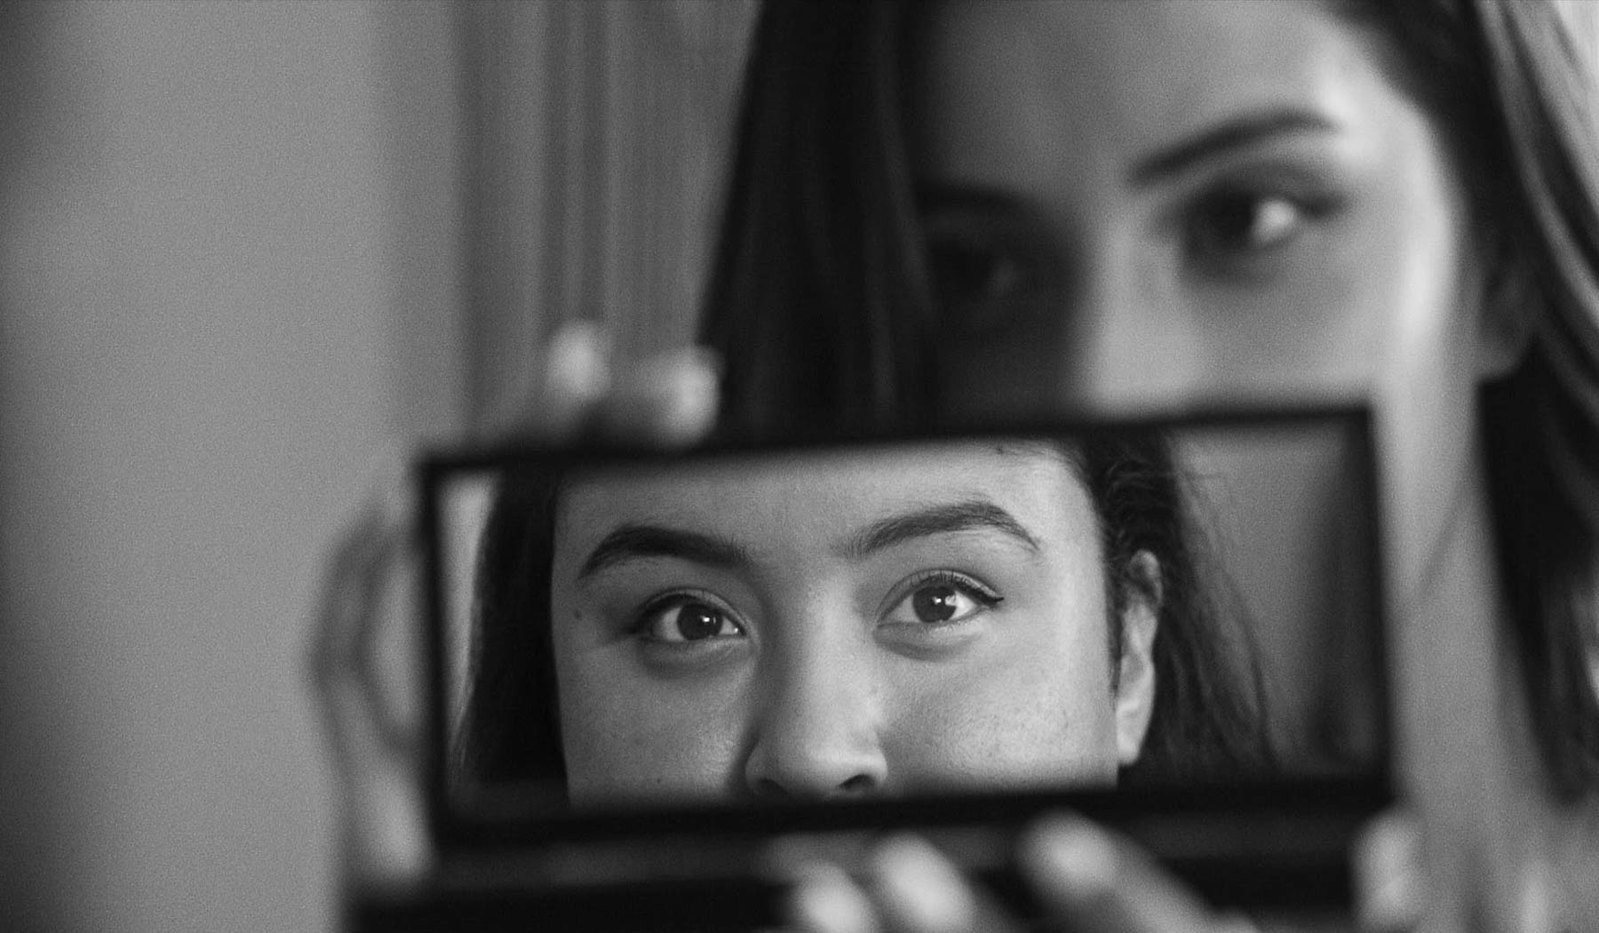 This Compton Actress Stars As a Queer, Undocumented Salvadoran in New Film 'La Leyenda Negra'